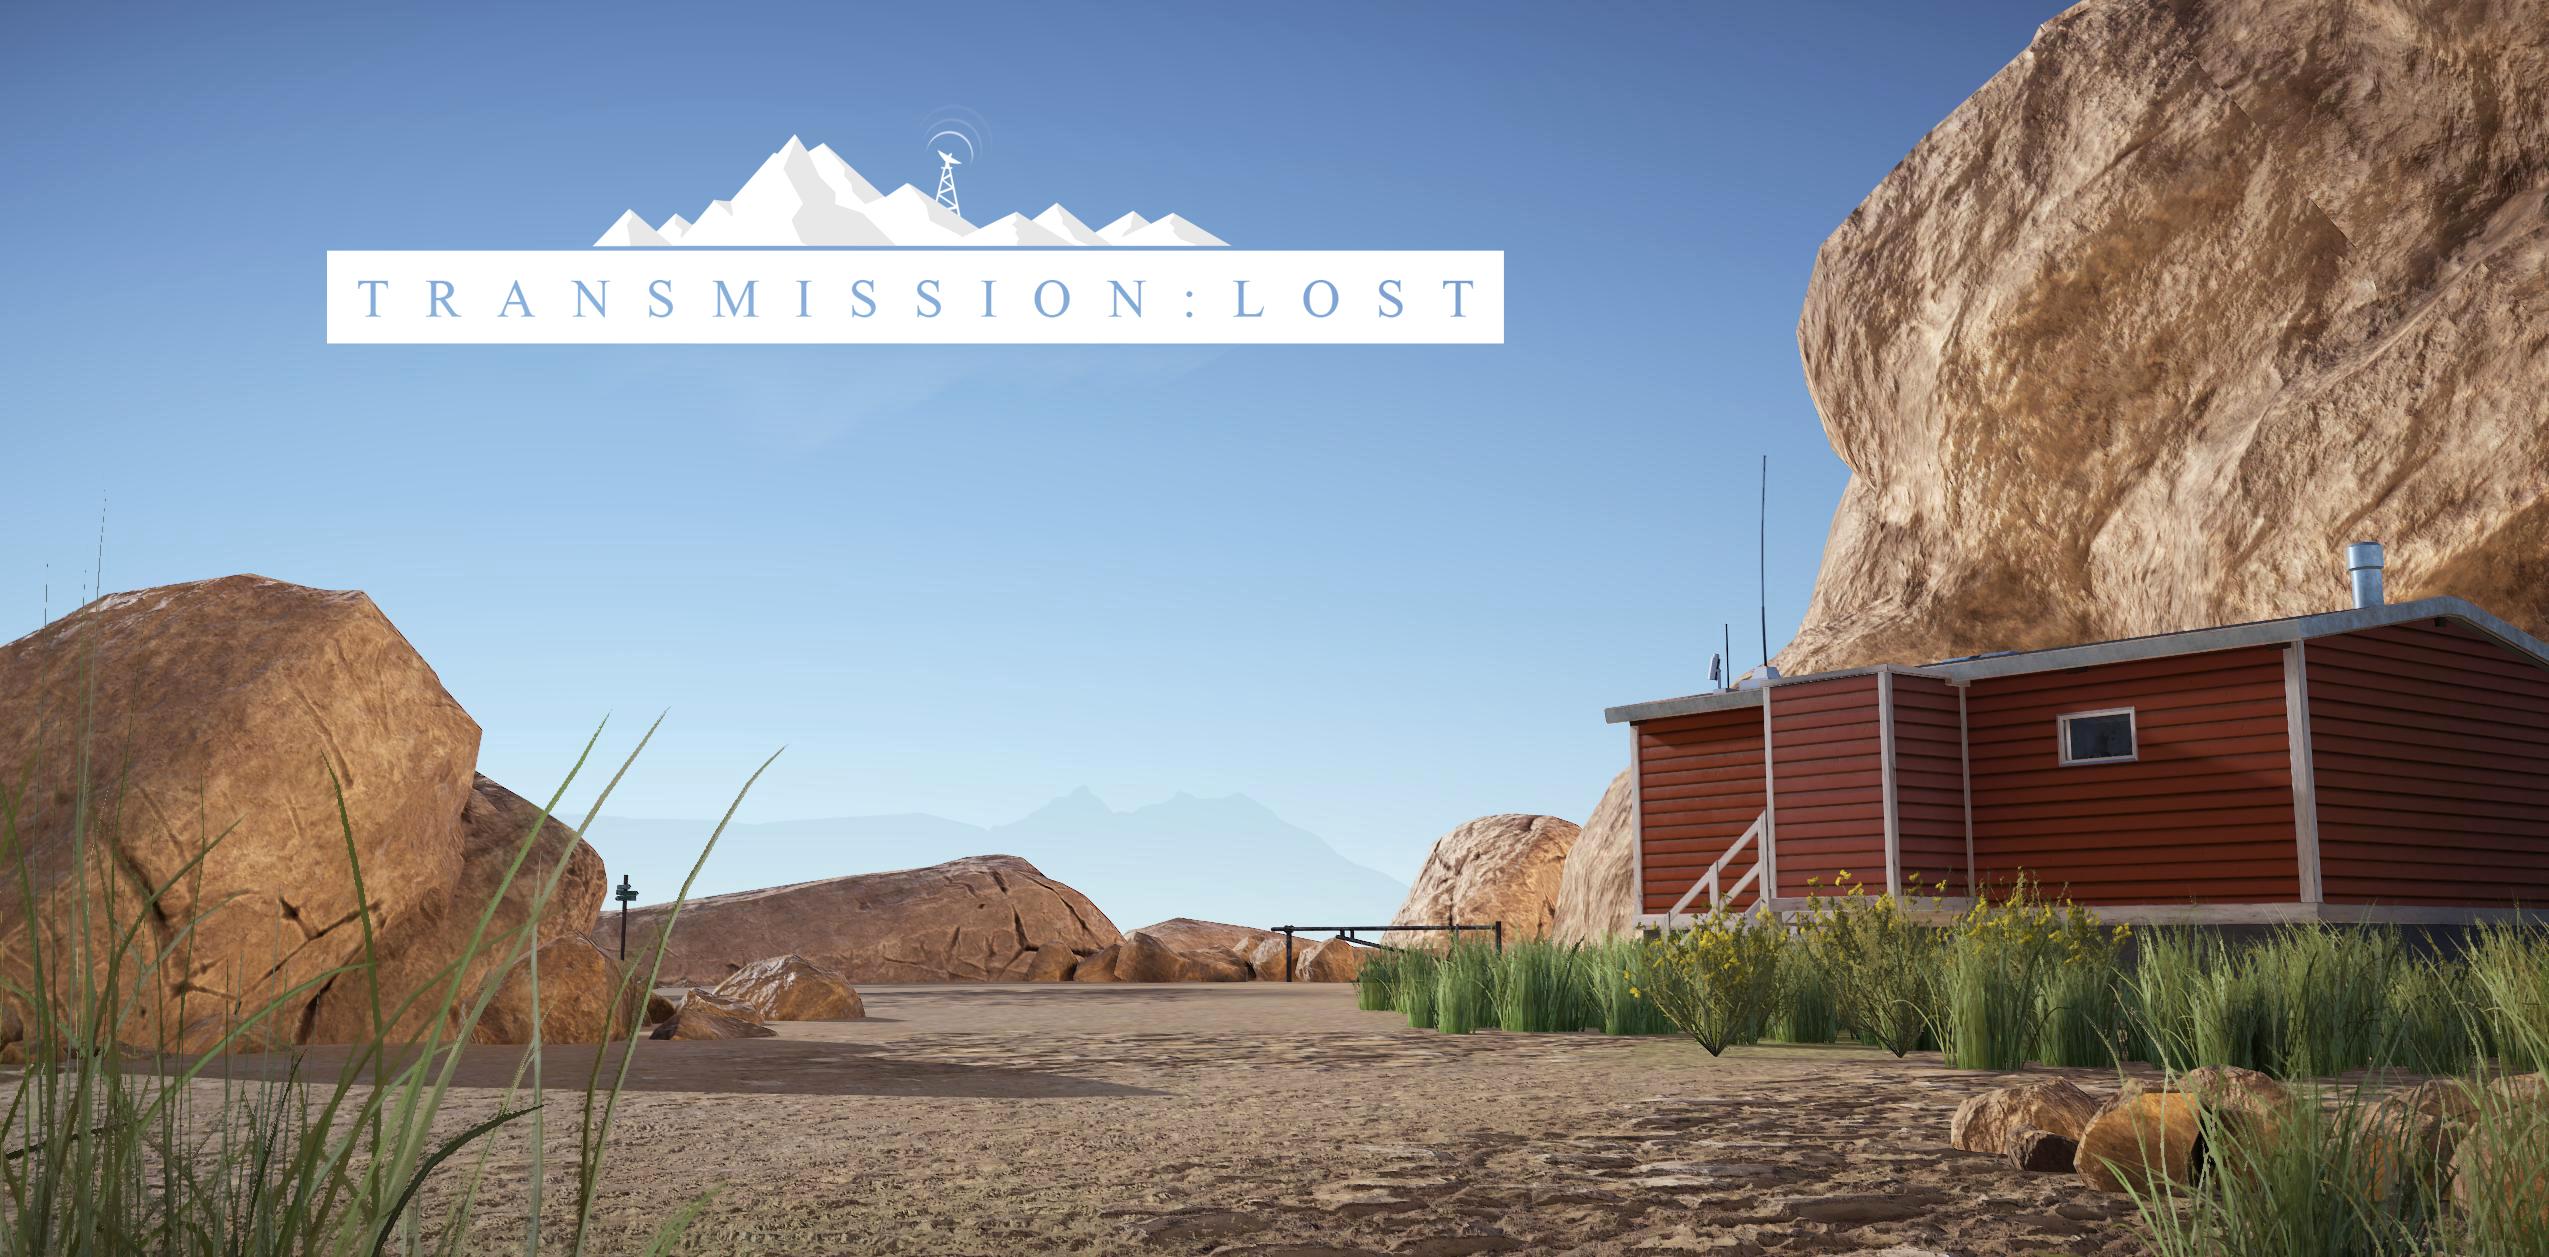 Transmission: Lost